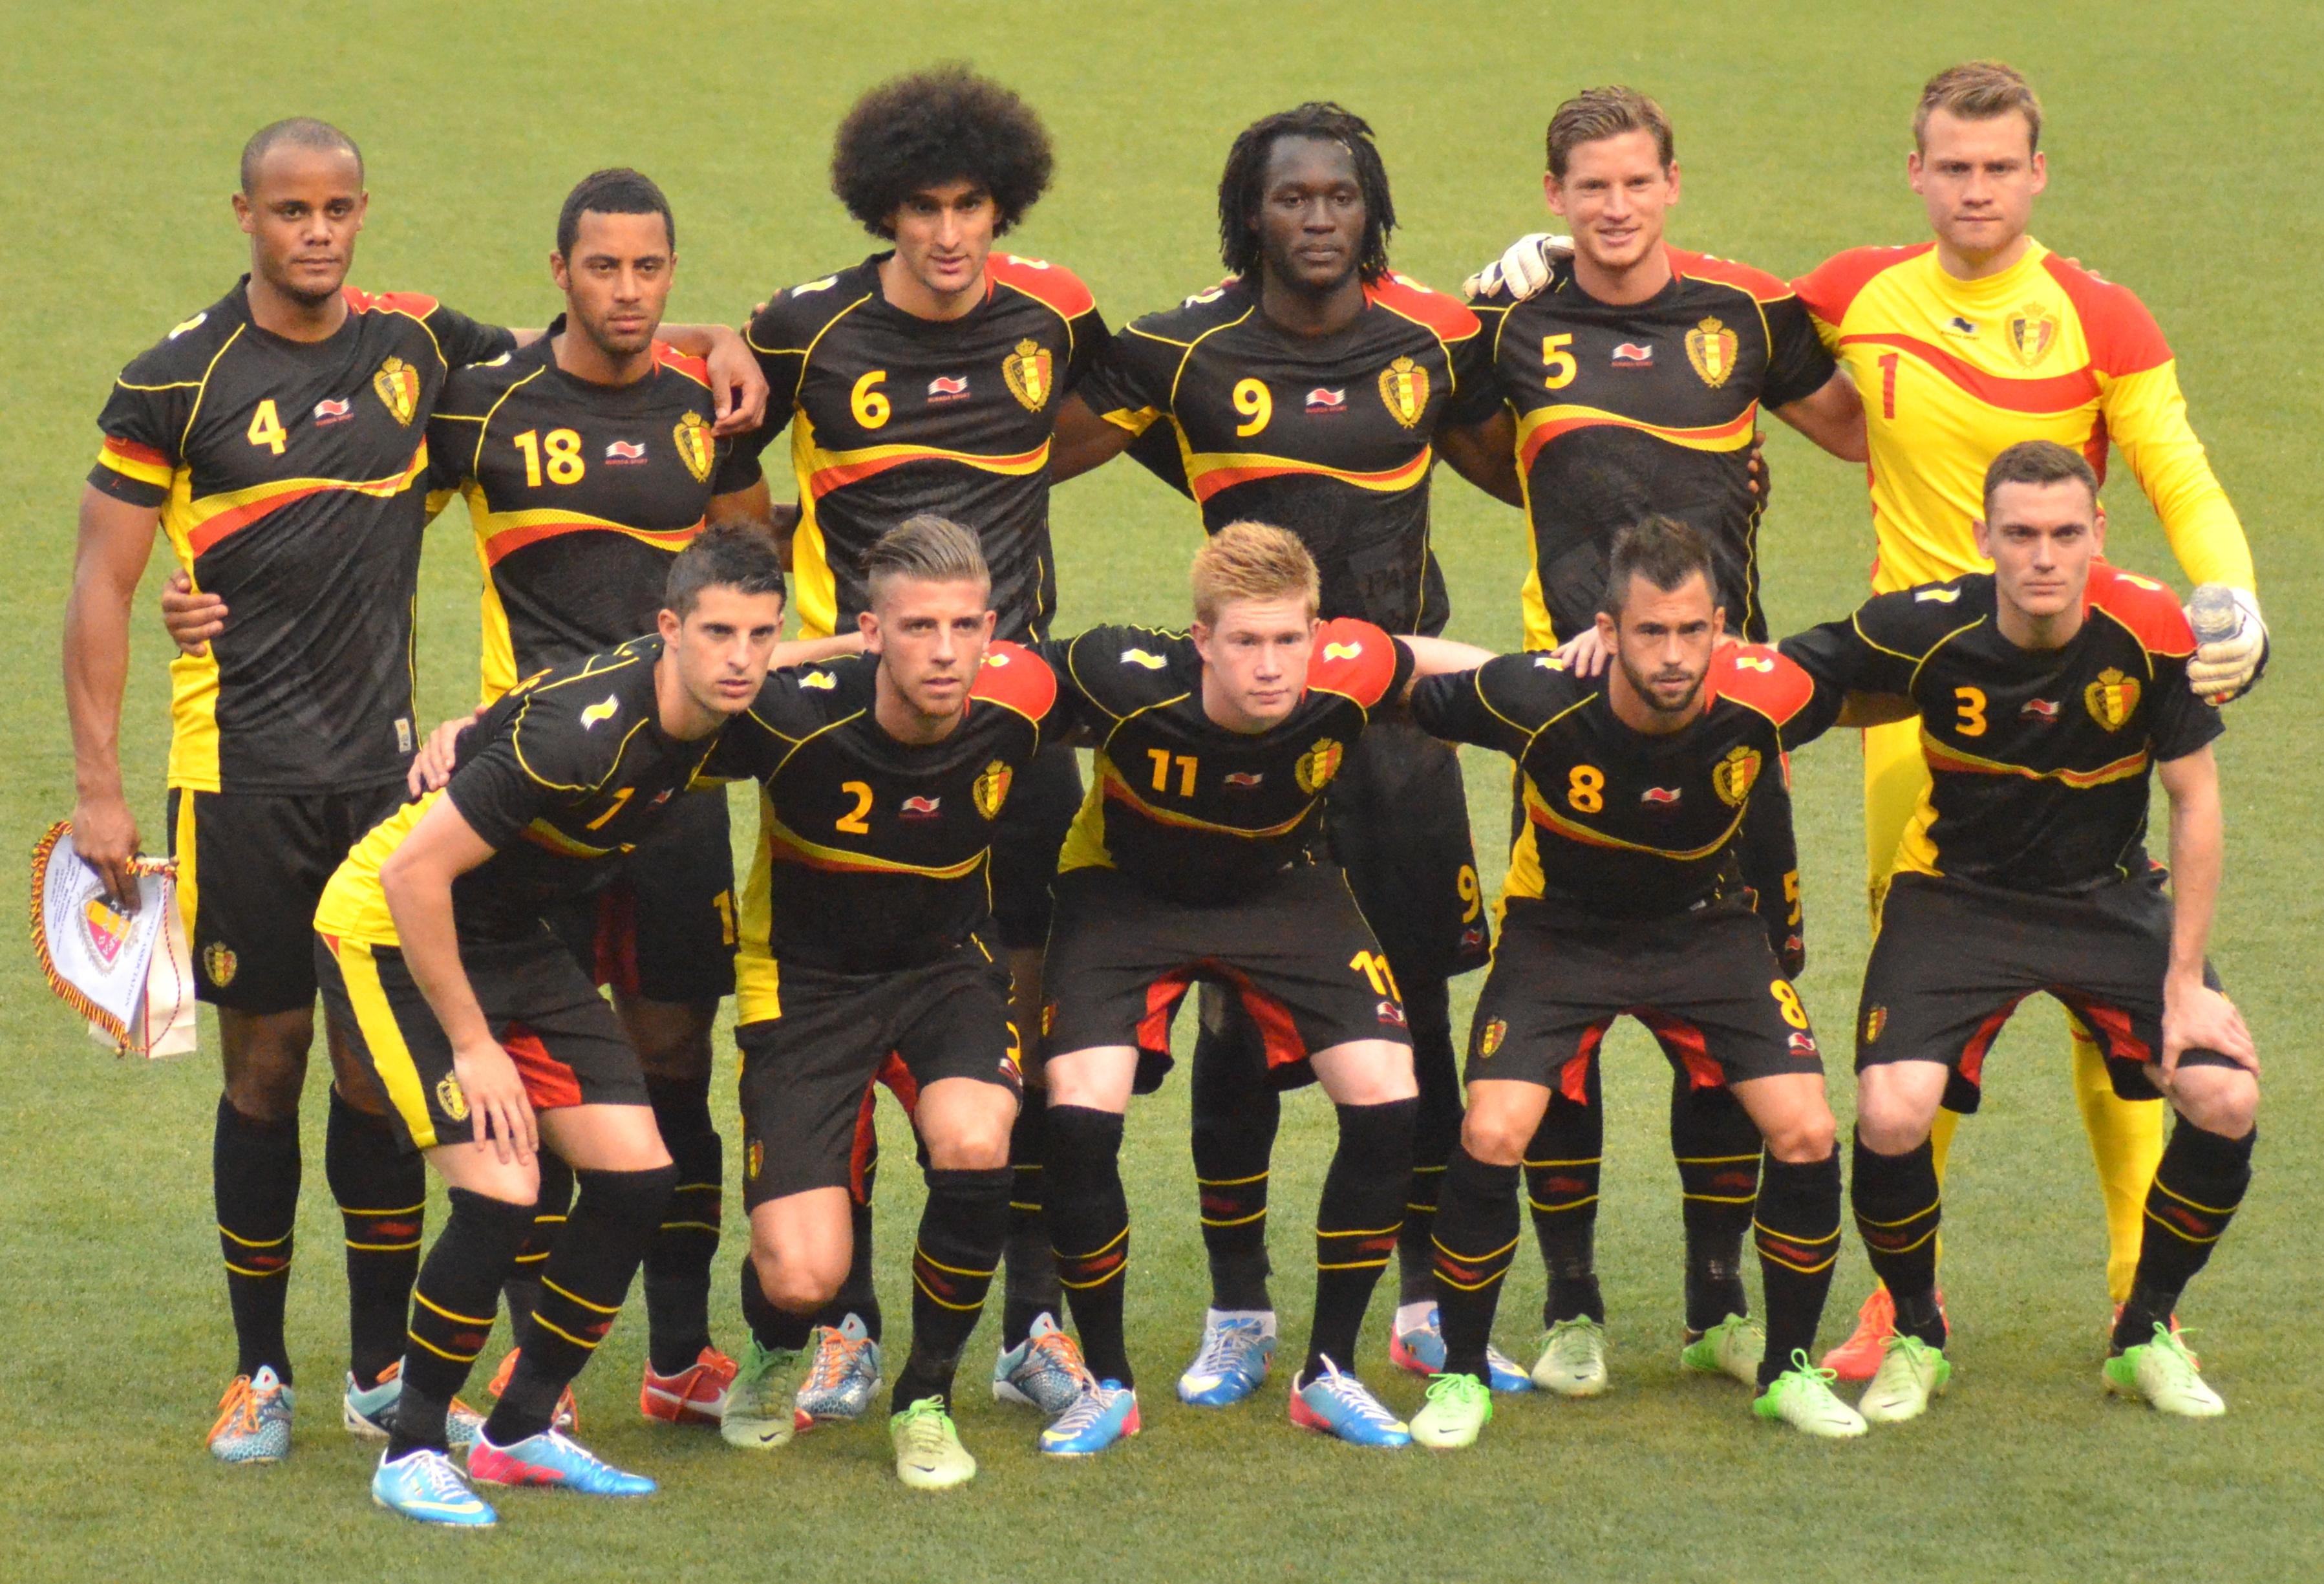 edfd870d2 File Belgium National Team vs USA 2013.jpg - Wikimedia Commons